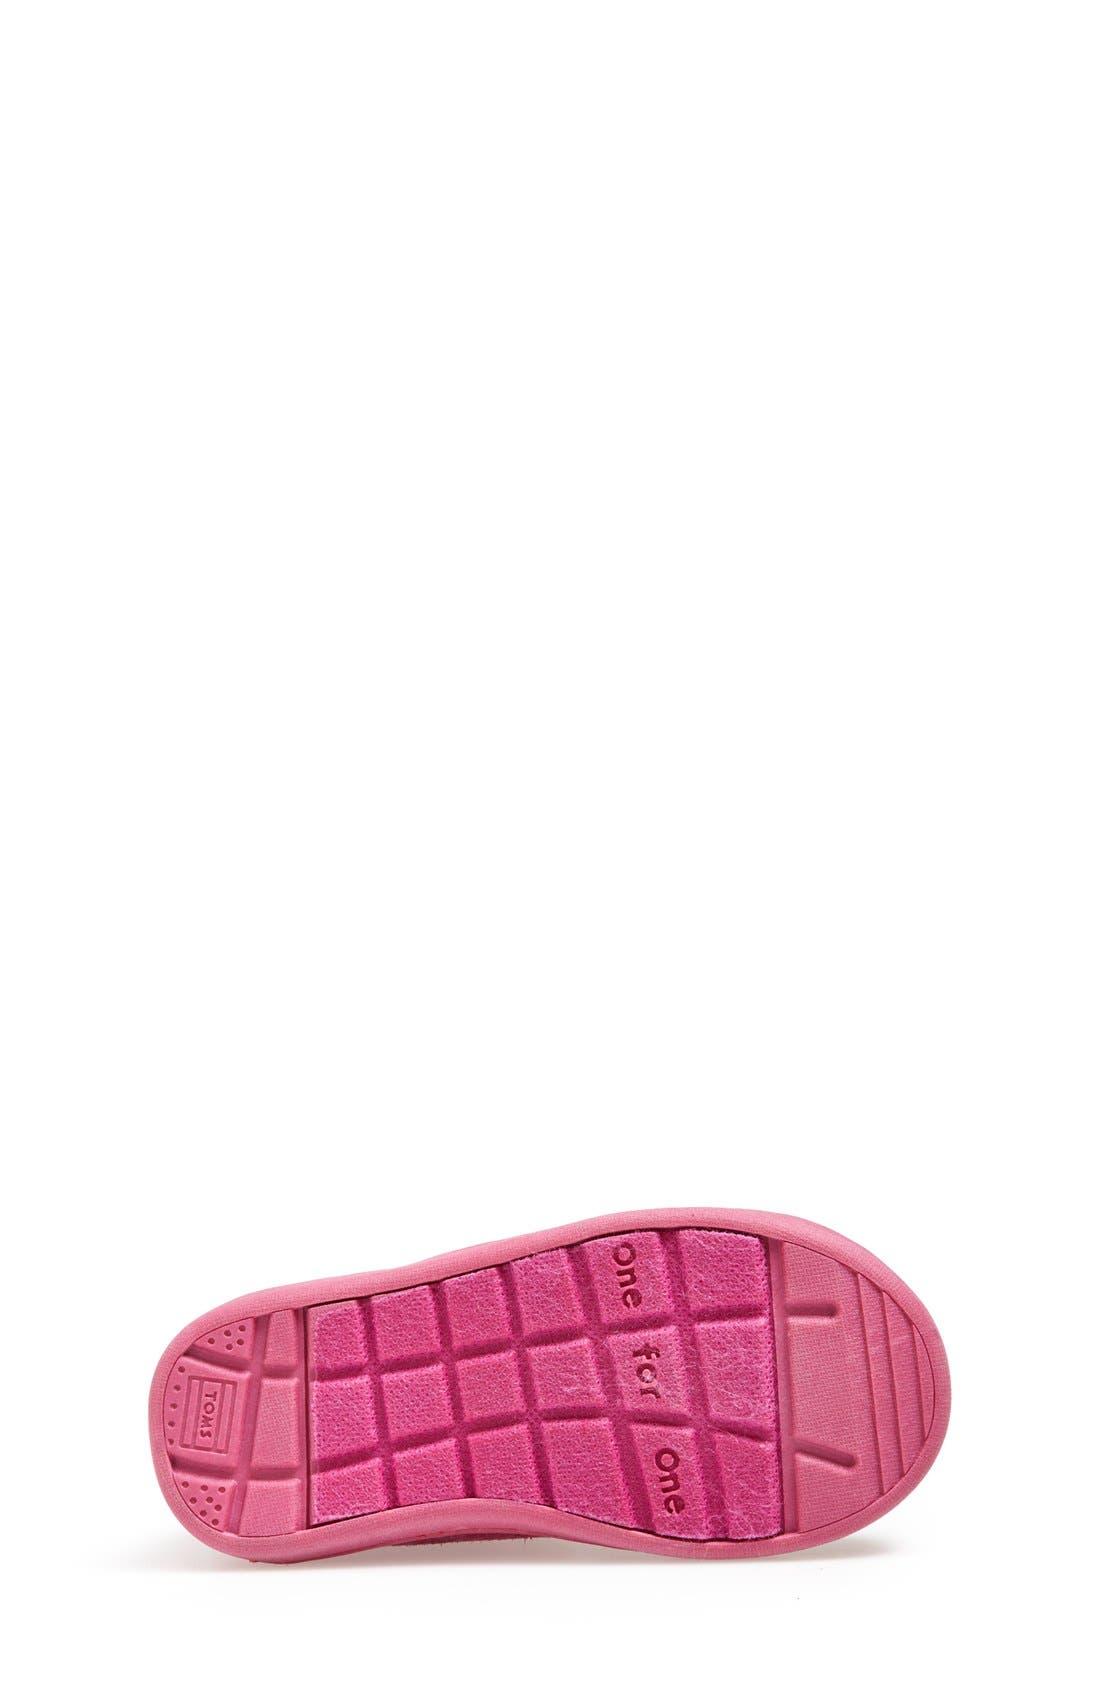 'Nepal - Tiny' Boot,                             Alternate thumbnail 4, color,                             Pink Multi Zigzag